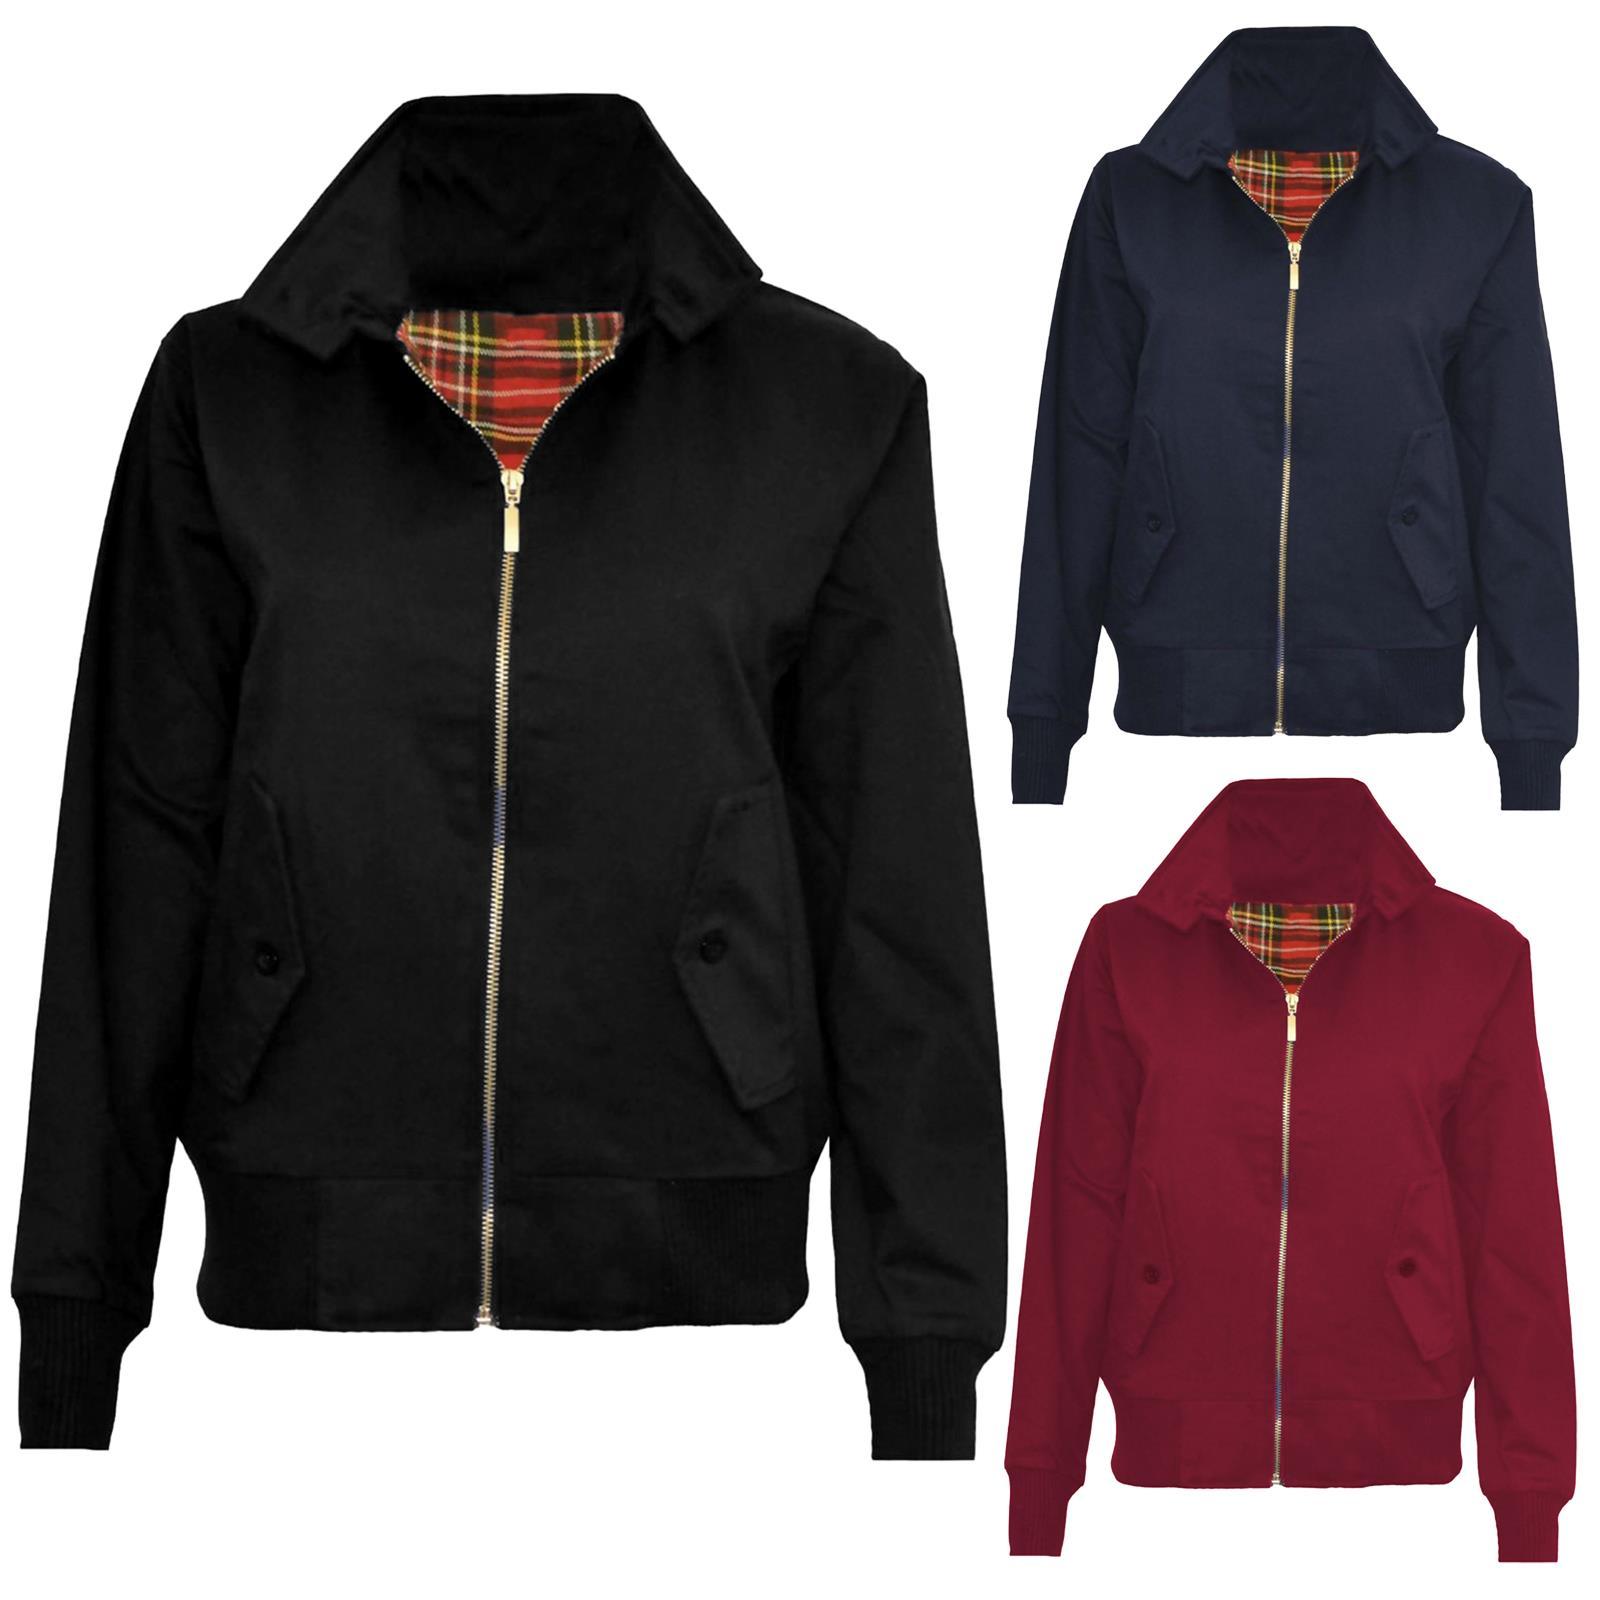 Harrington Mens Jacket Classic Retro Zip Jacket Vintage Coat Mod Bomber